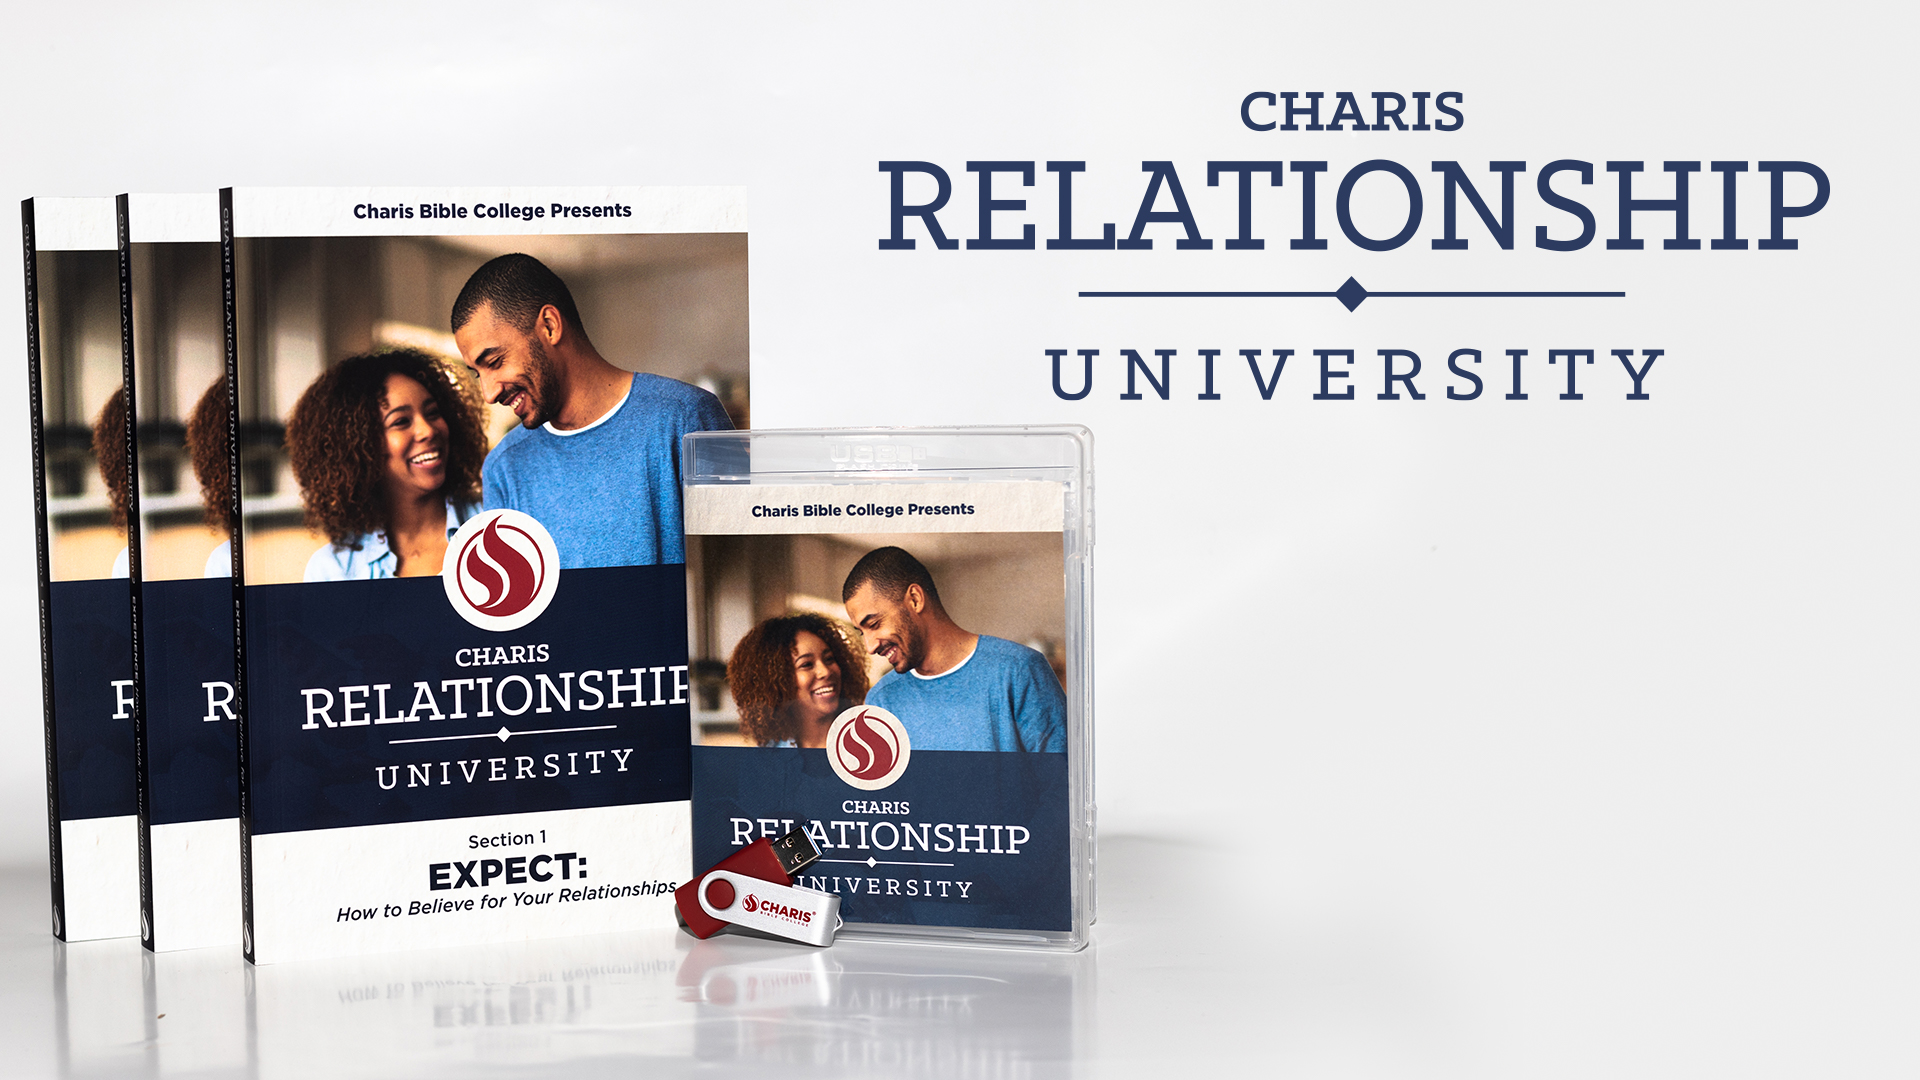 Charis Relationship University